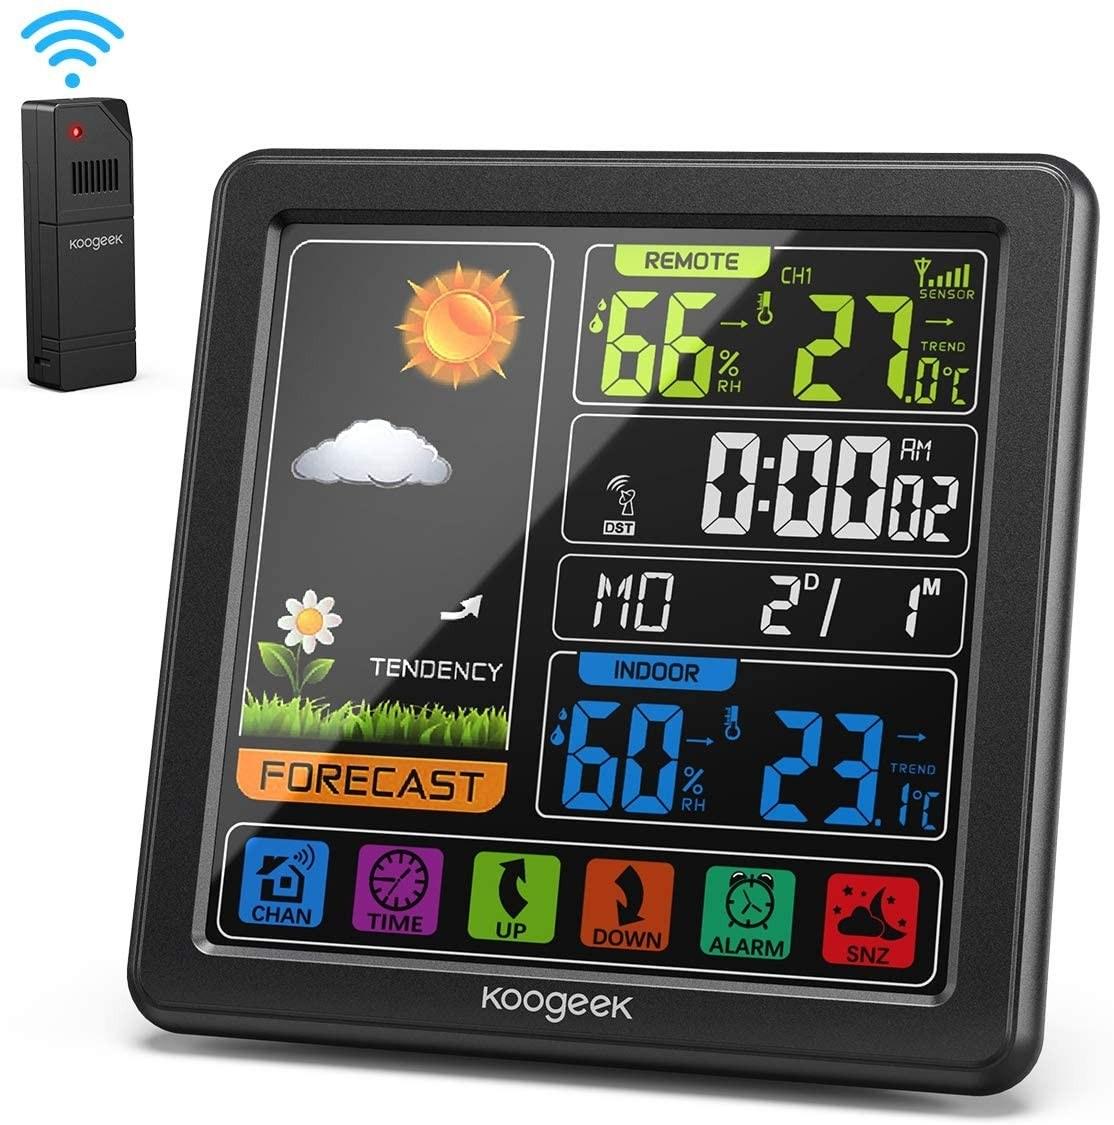 Tomtop - [US Warehouse] 45% OFF Koogeek Wireless Weather Station, $21.99 (Inclusive of VAT)